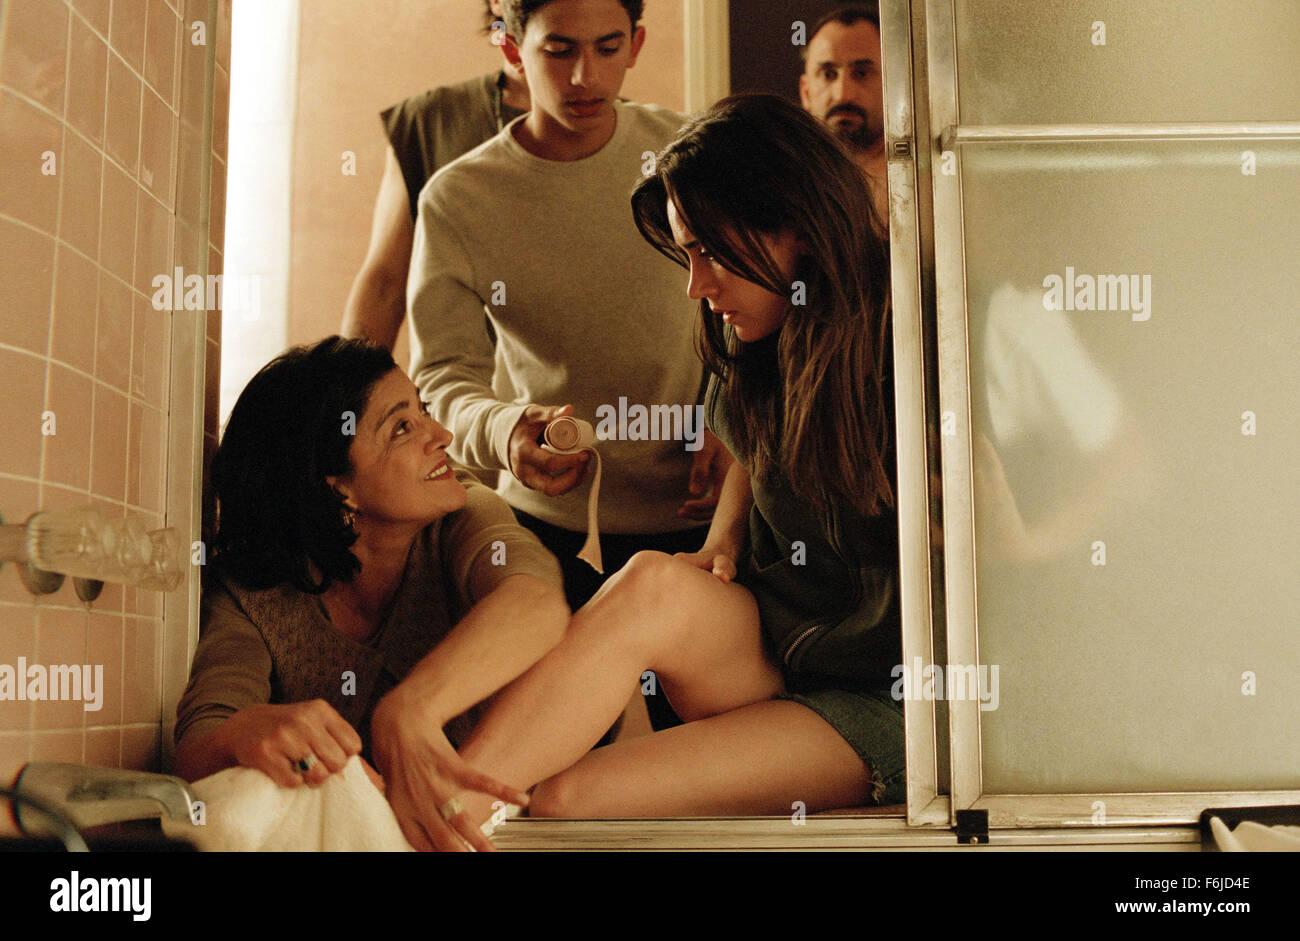 Nov 11, 2003; Hollywood, CA, USA; Nadi (SHOHREH AGHDASHLOO, left) tries to help mend Kathy Nicolo's (JENNIFER - Stock Image